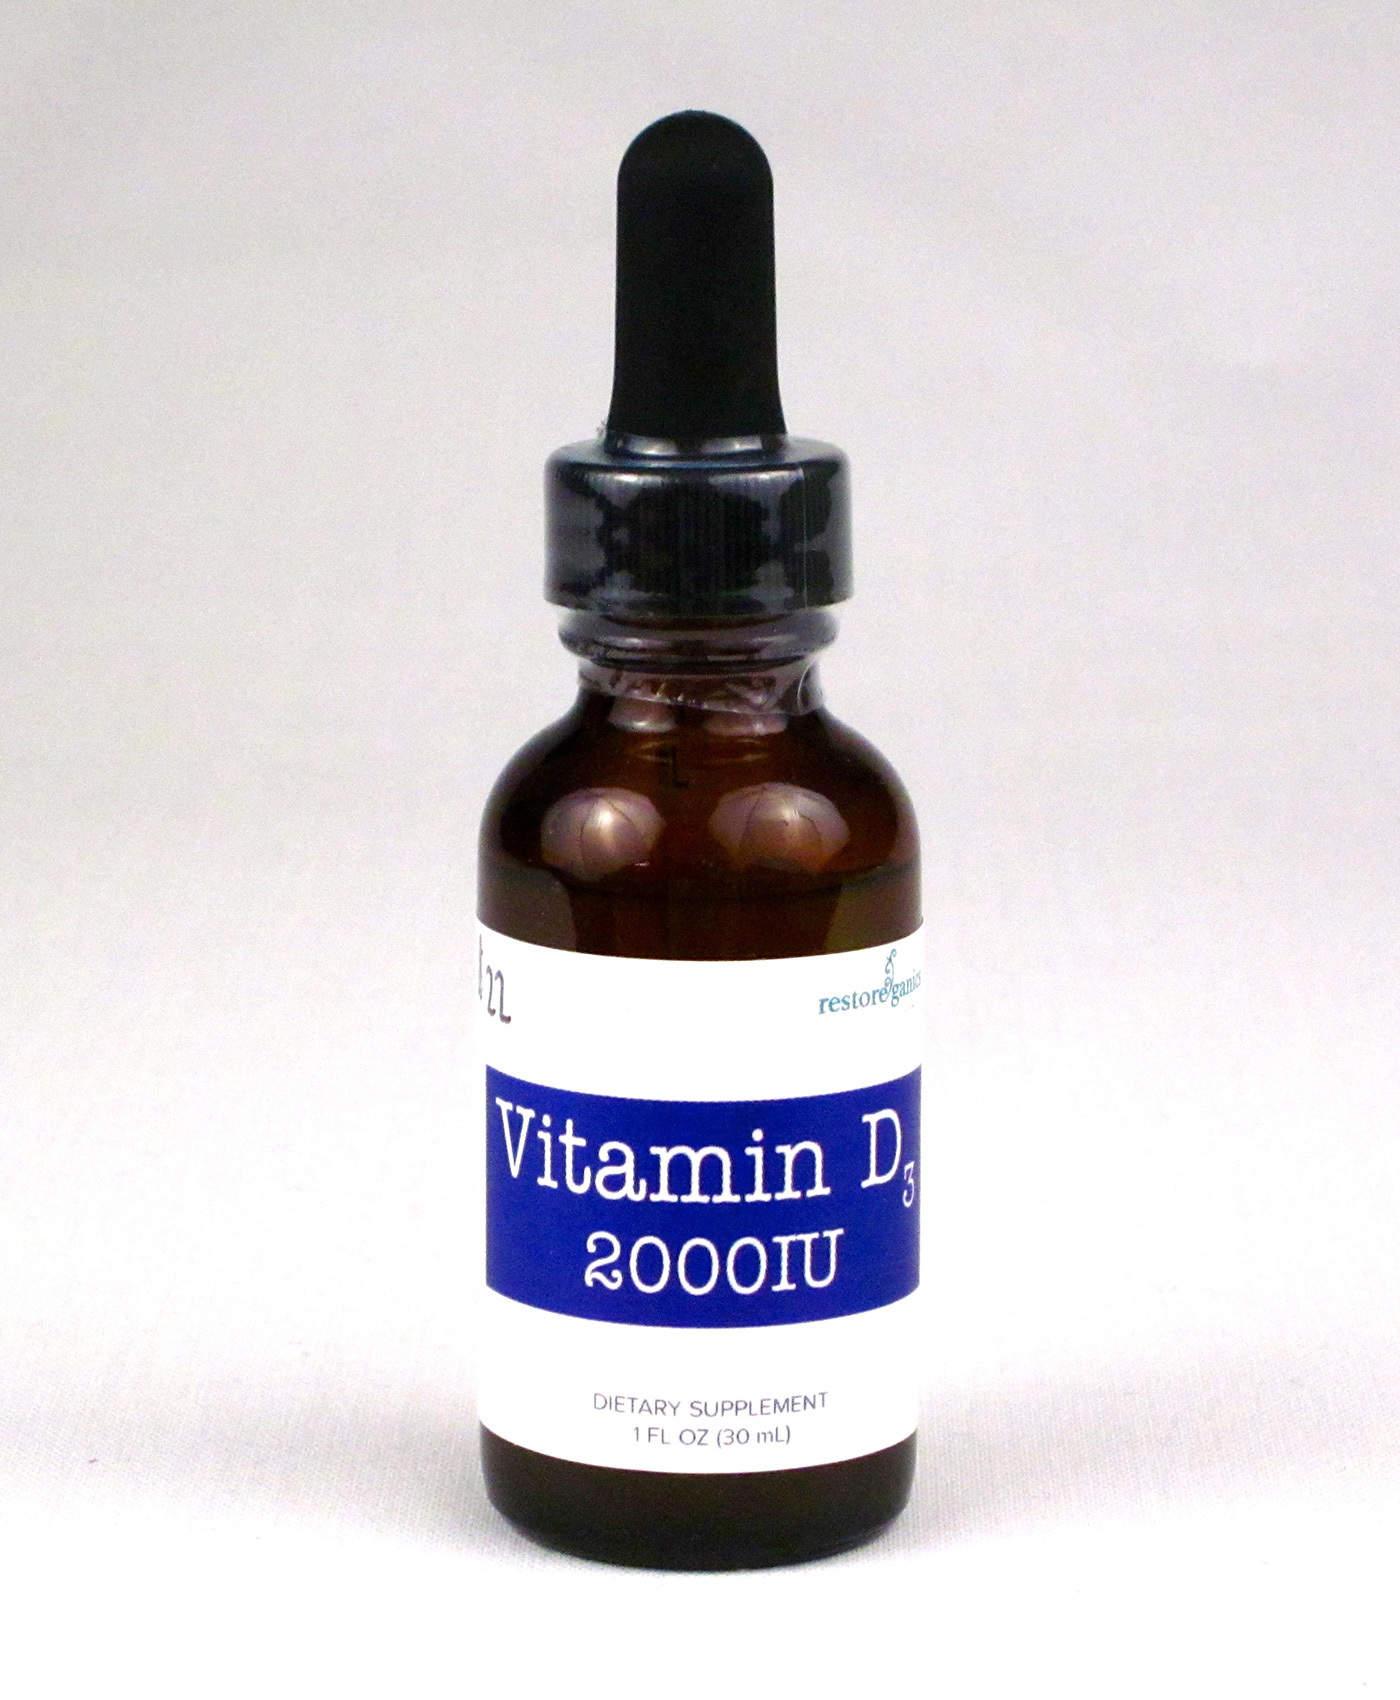 Vitamin D 2000IU